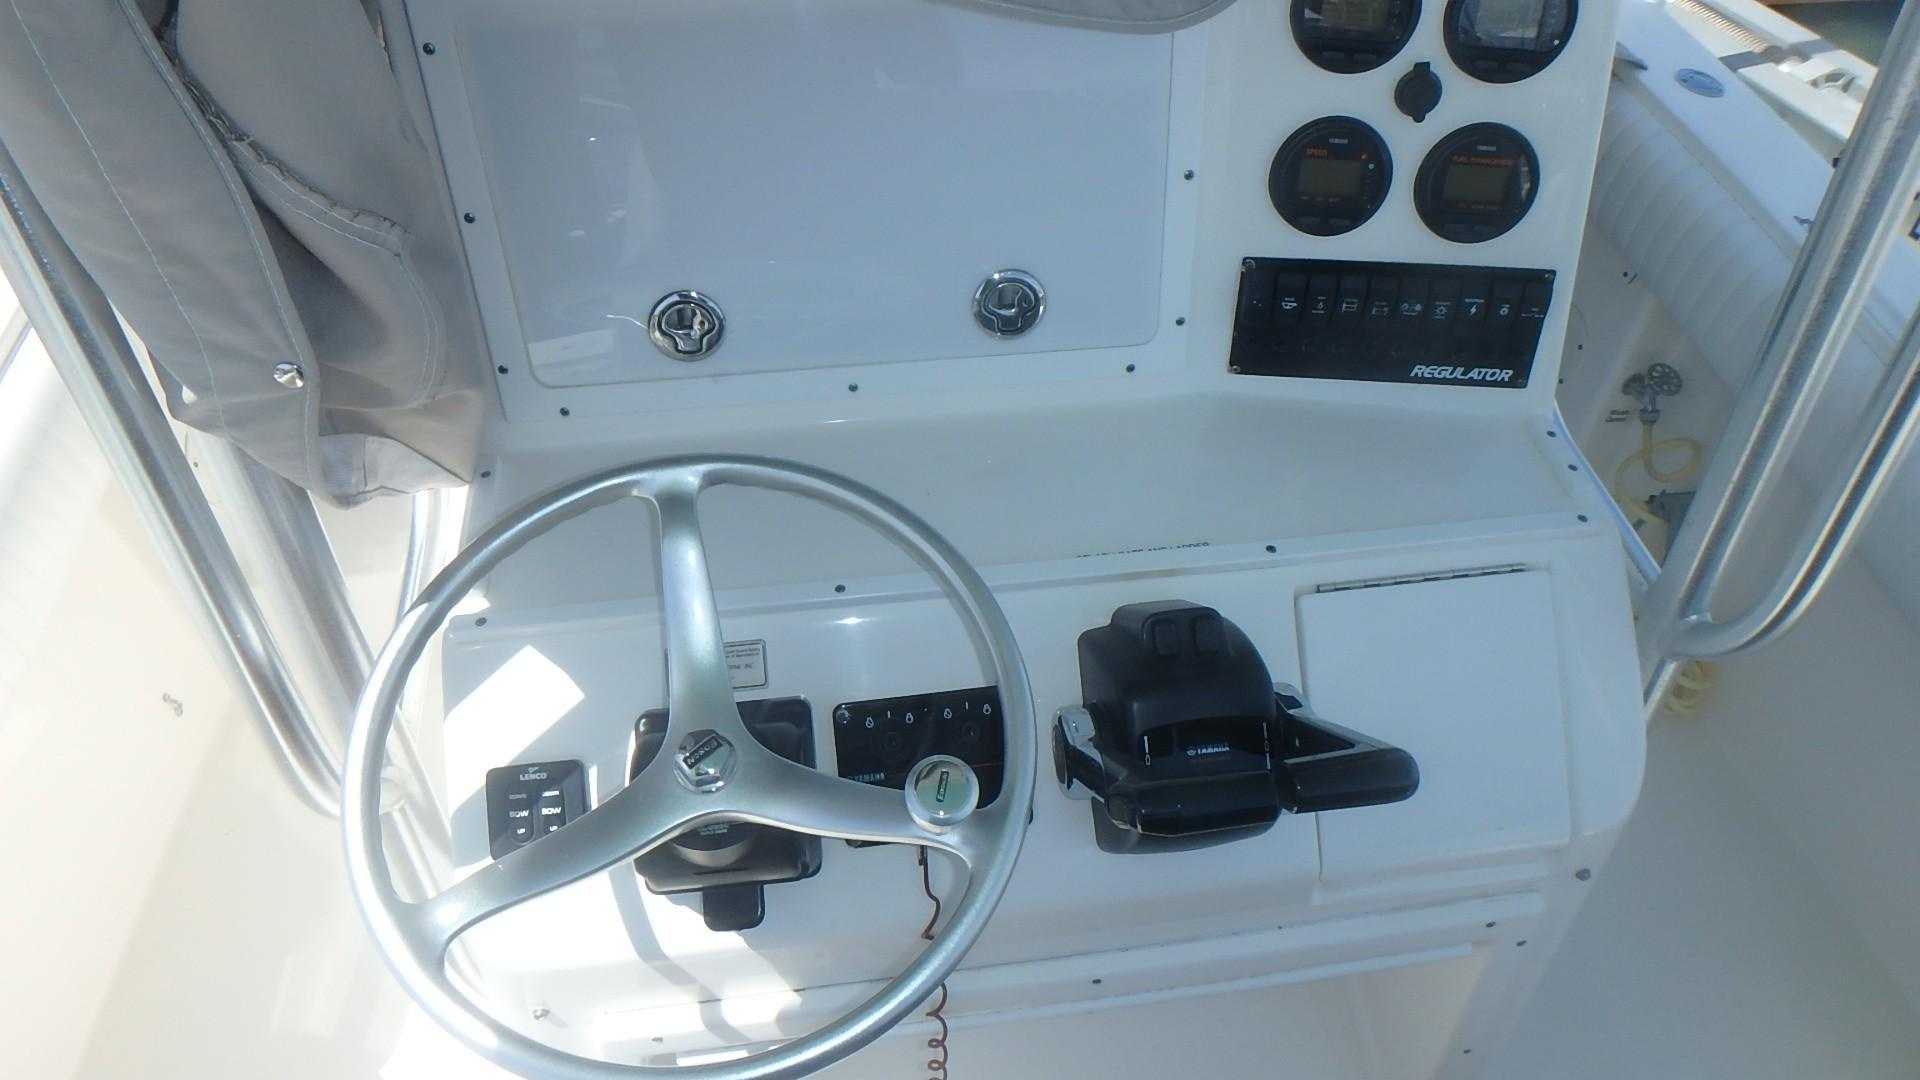 Regulator 23 Forward Seating - Helm